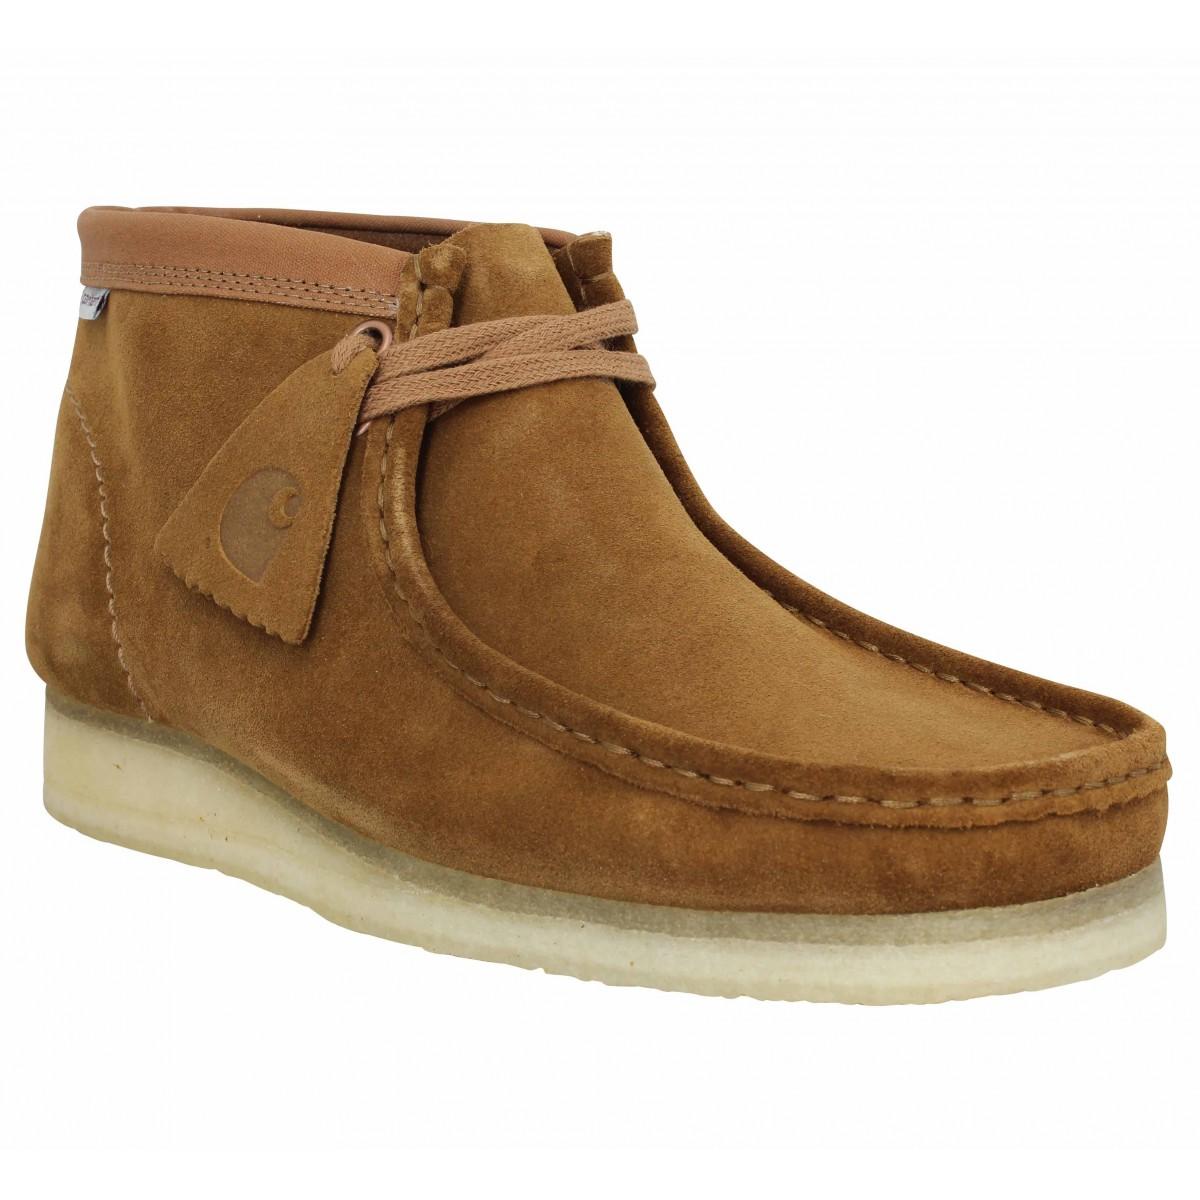 Bottines CLARKS ORIGINALS X CARHARTT Wallabee Boot velours Homme Brown